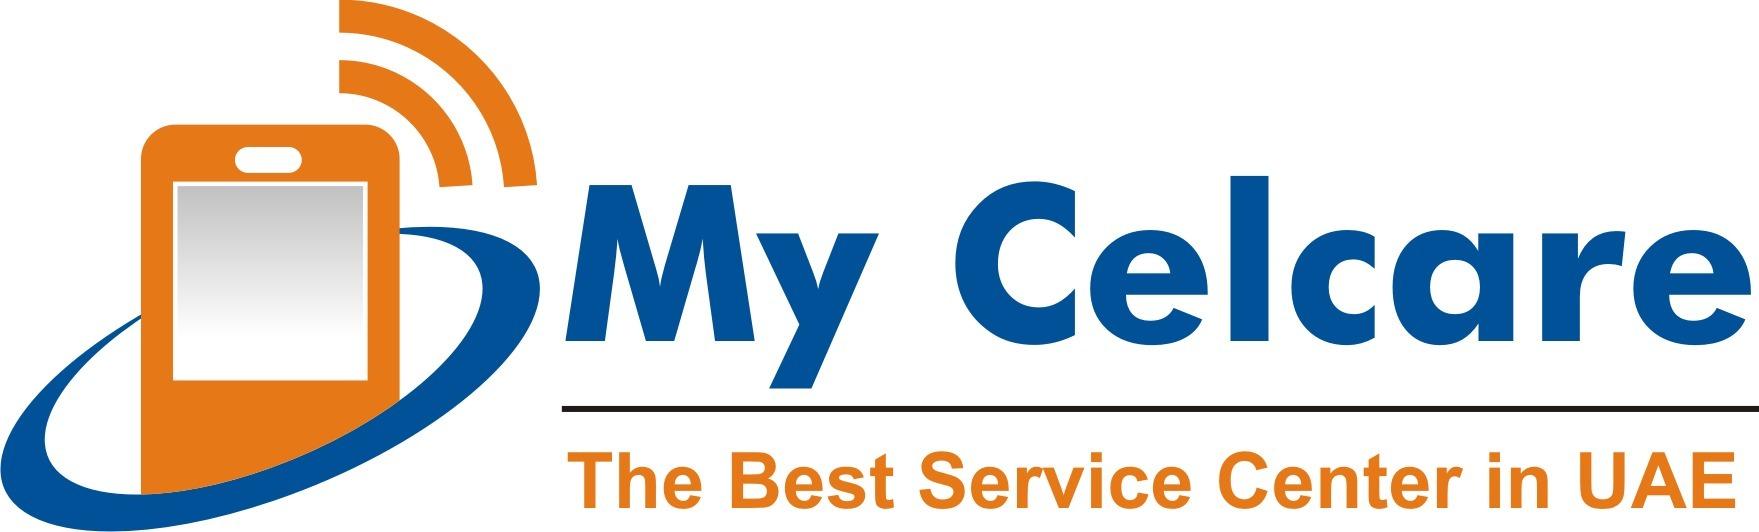 My Celcare JLT (@mycelcarejlt) Cover Image